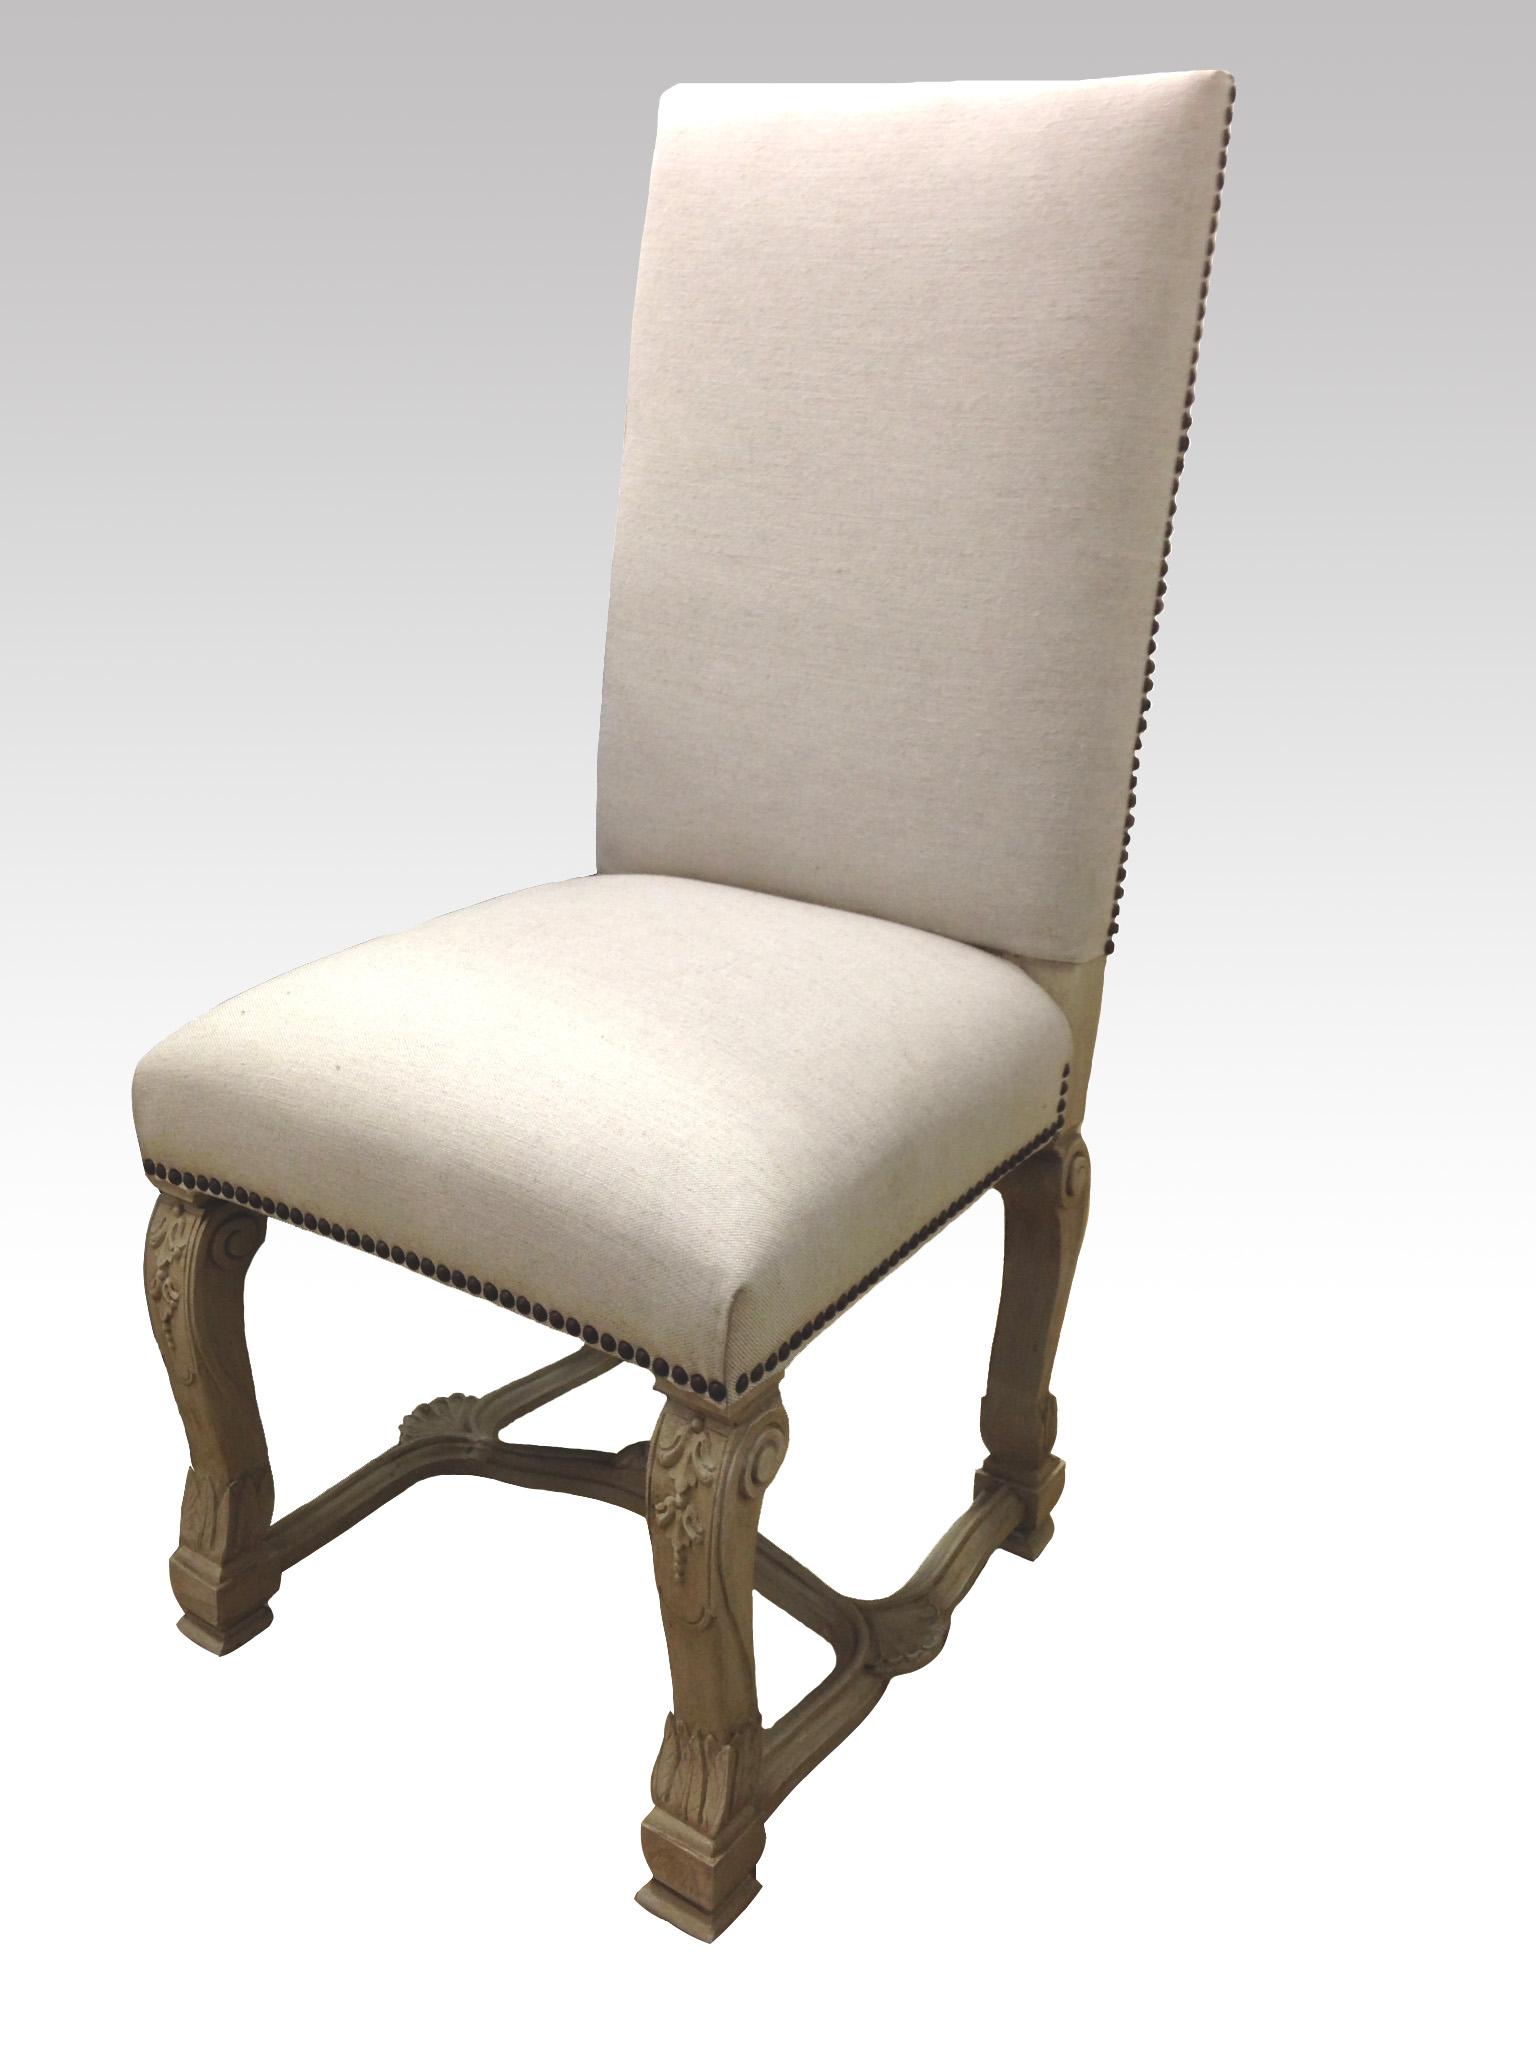 Dining chair 4.jpg